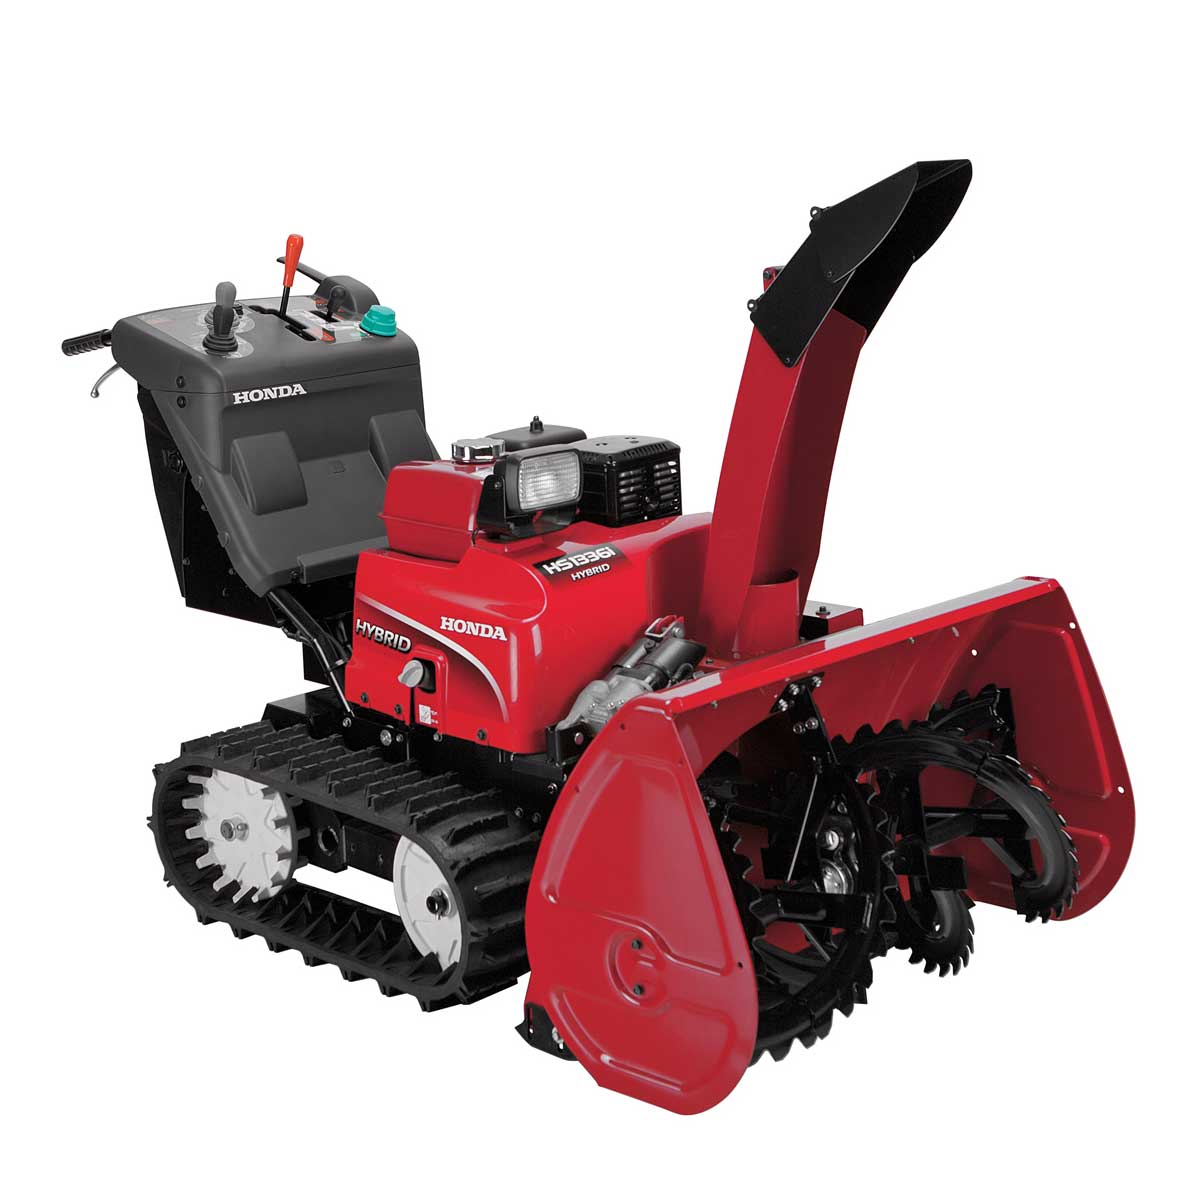 Honda Snow Blower HS1336iAS